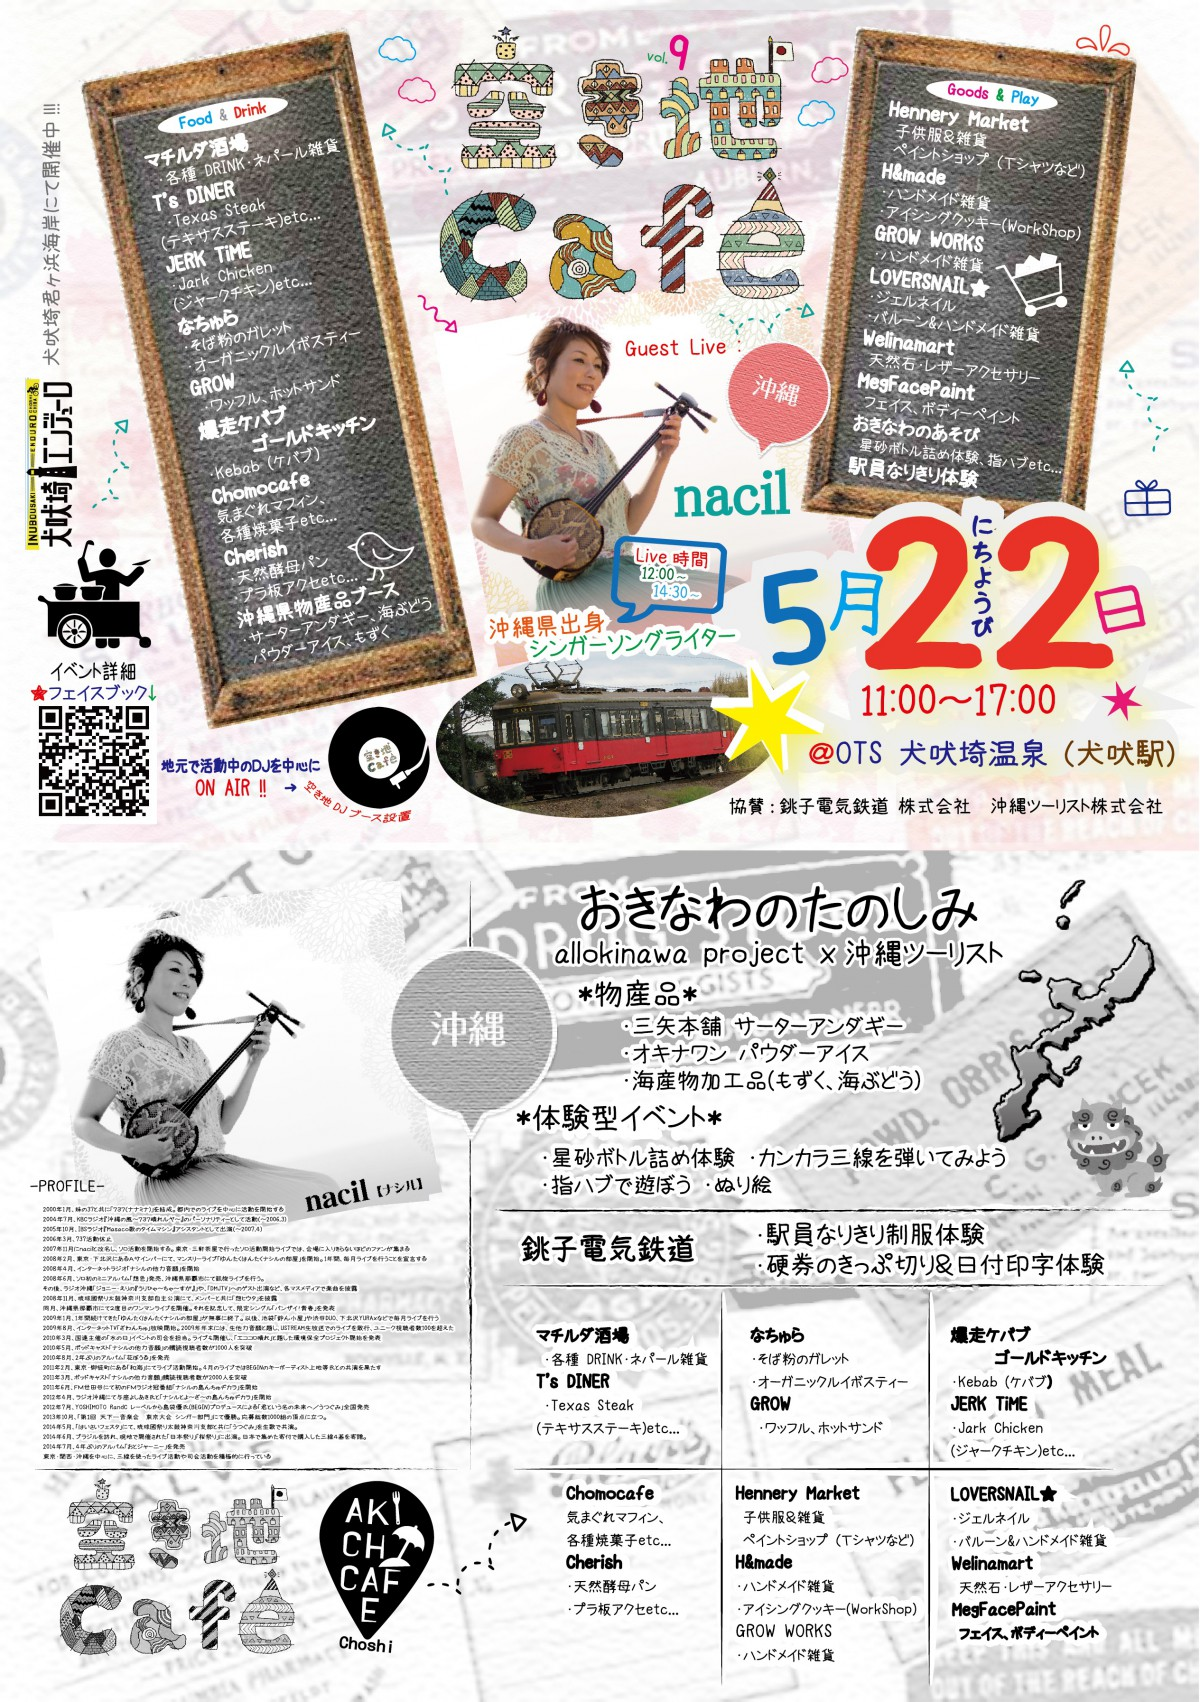 akichi2.jpg